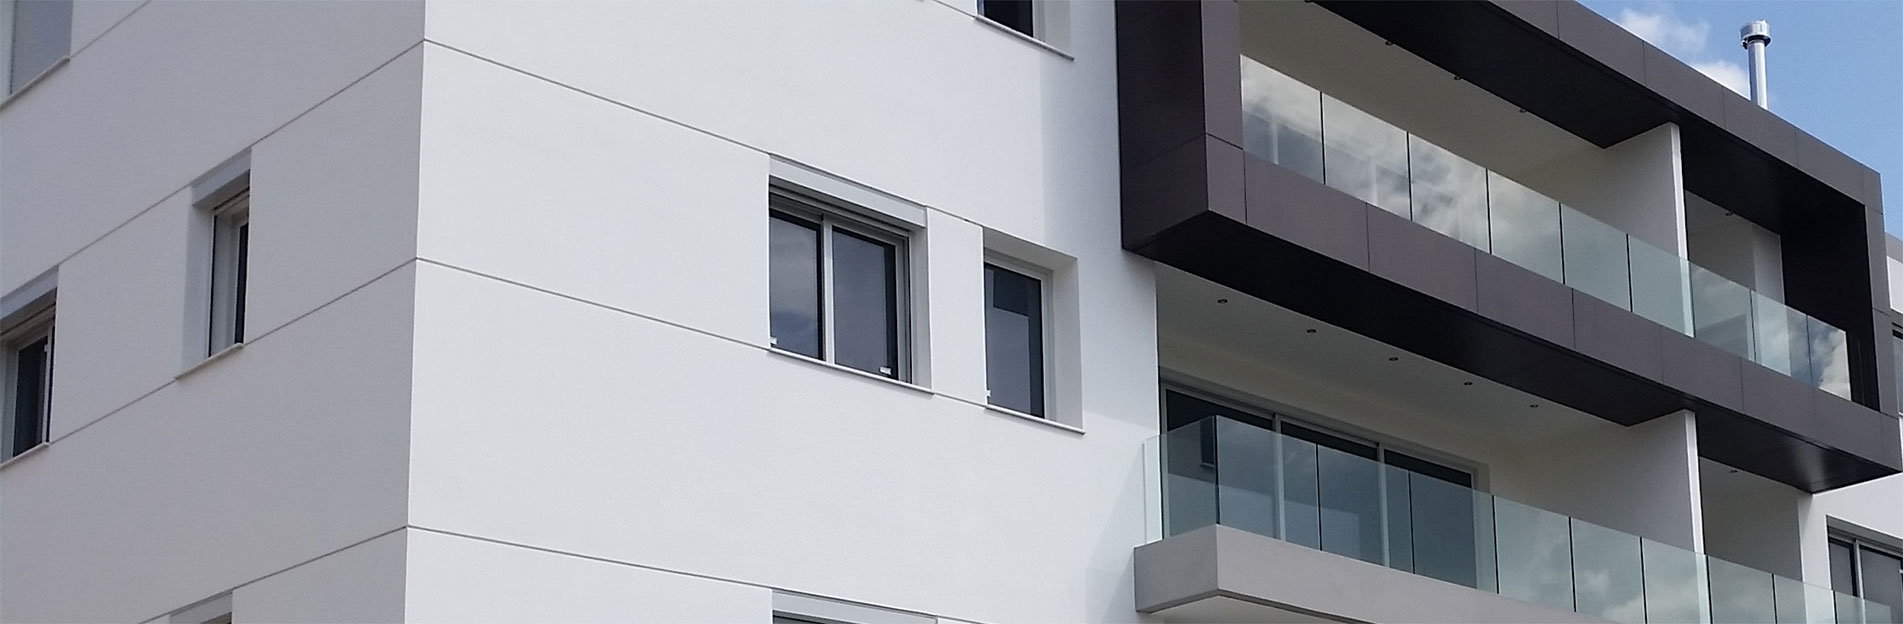 Aglantzia apartments